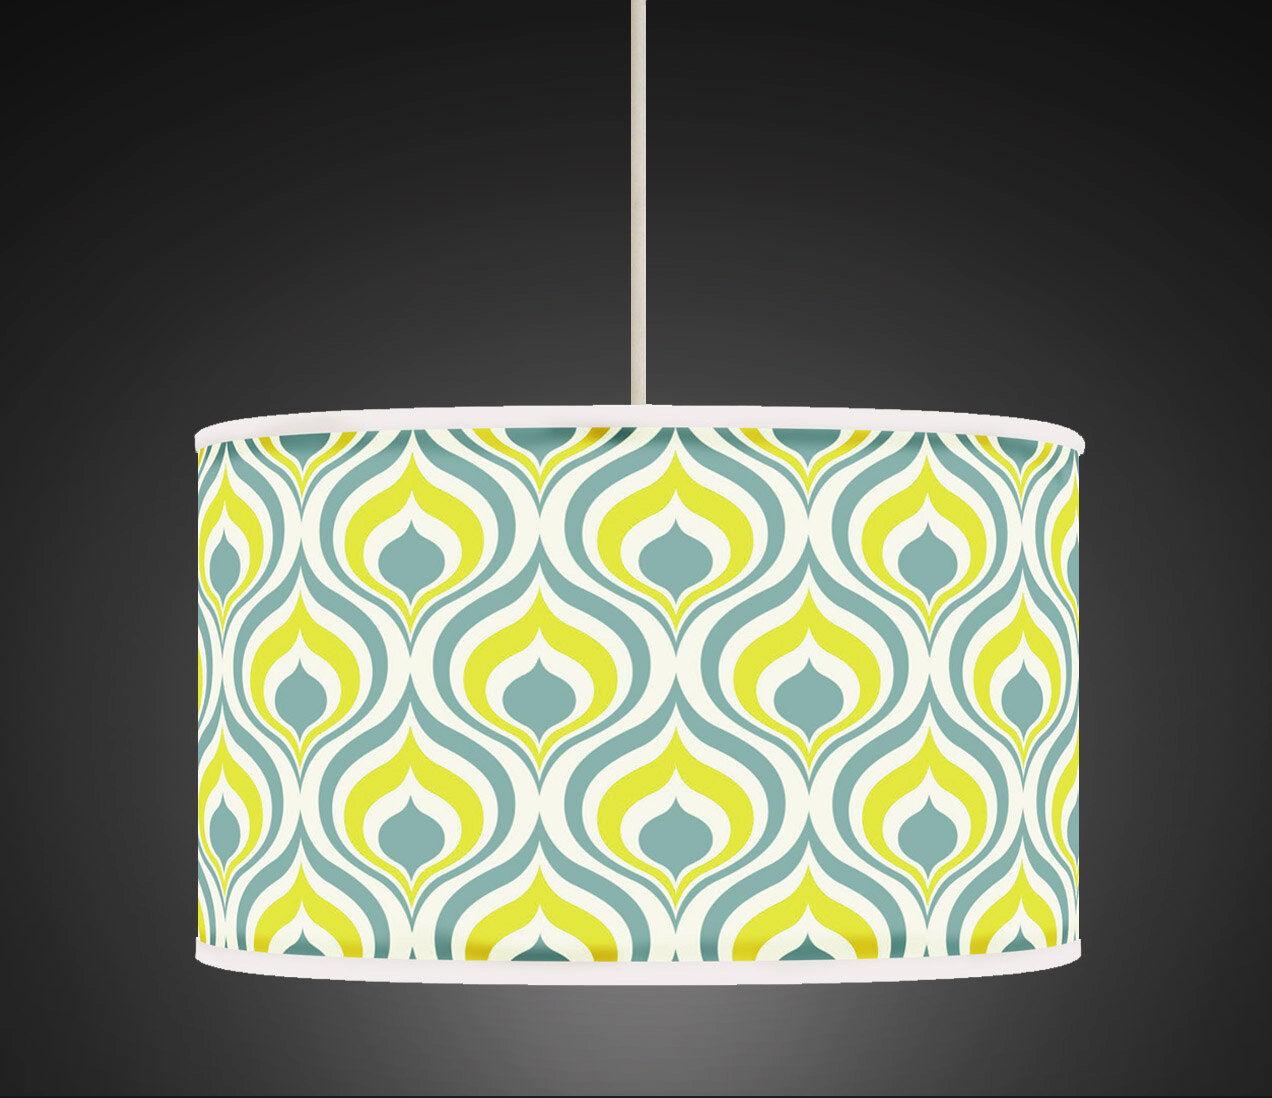 50cm jaune vert sauge géométrique handmade gicleel tissu abat-jour abat-jour tissu 449 9140ca